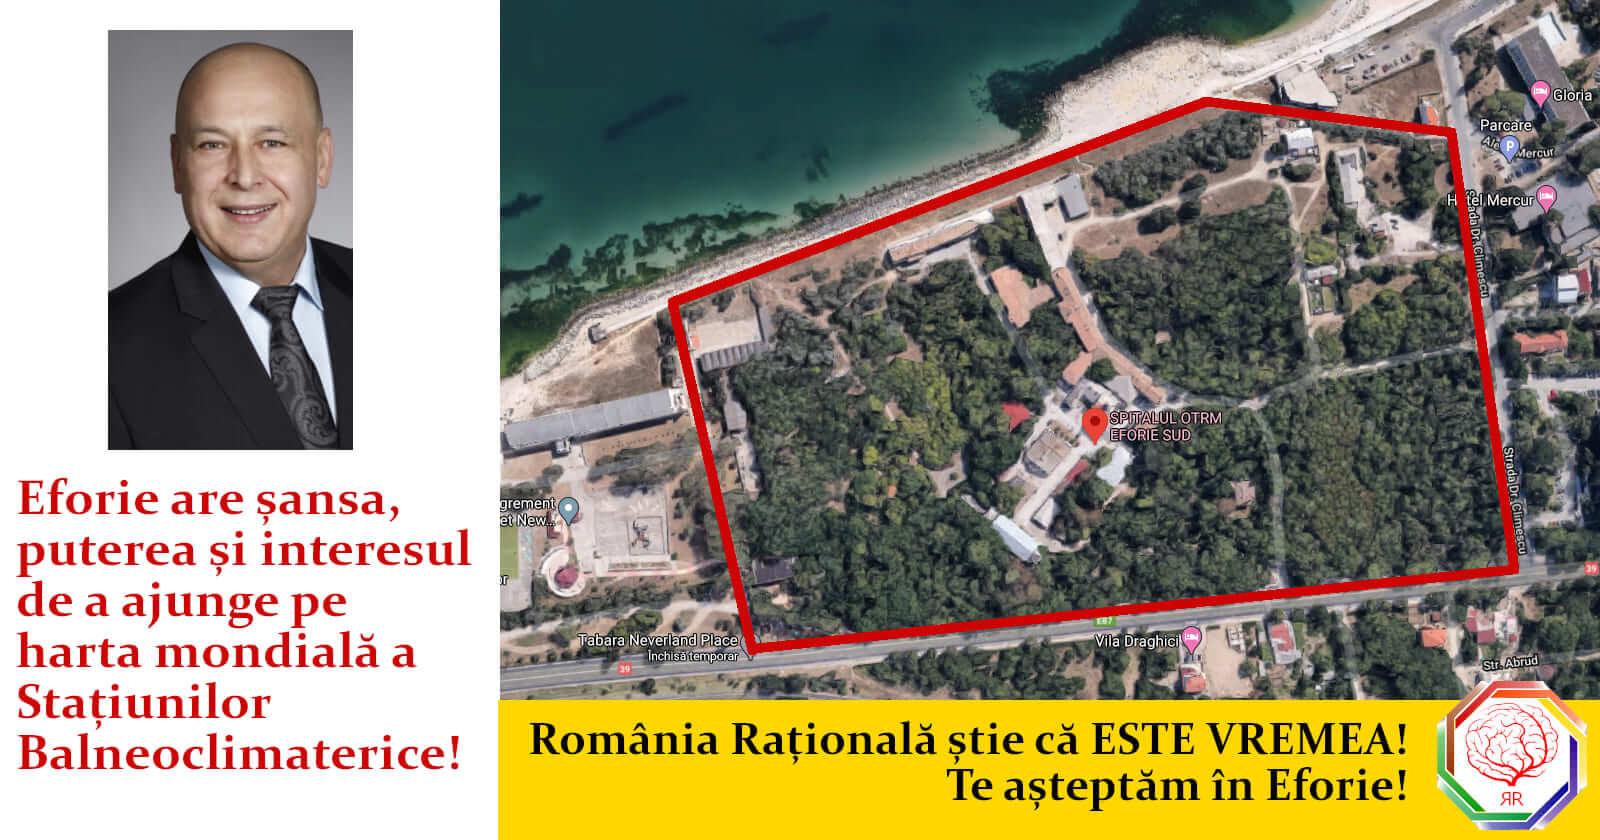 https://ziarul.romania-rationala.ro/control/articole/articole/valeriu-dragomir-candidat-romania-rationala-eforie-program-local-01.jpg